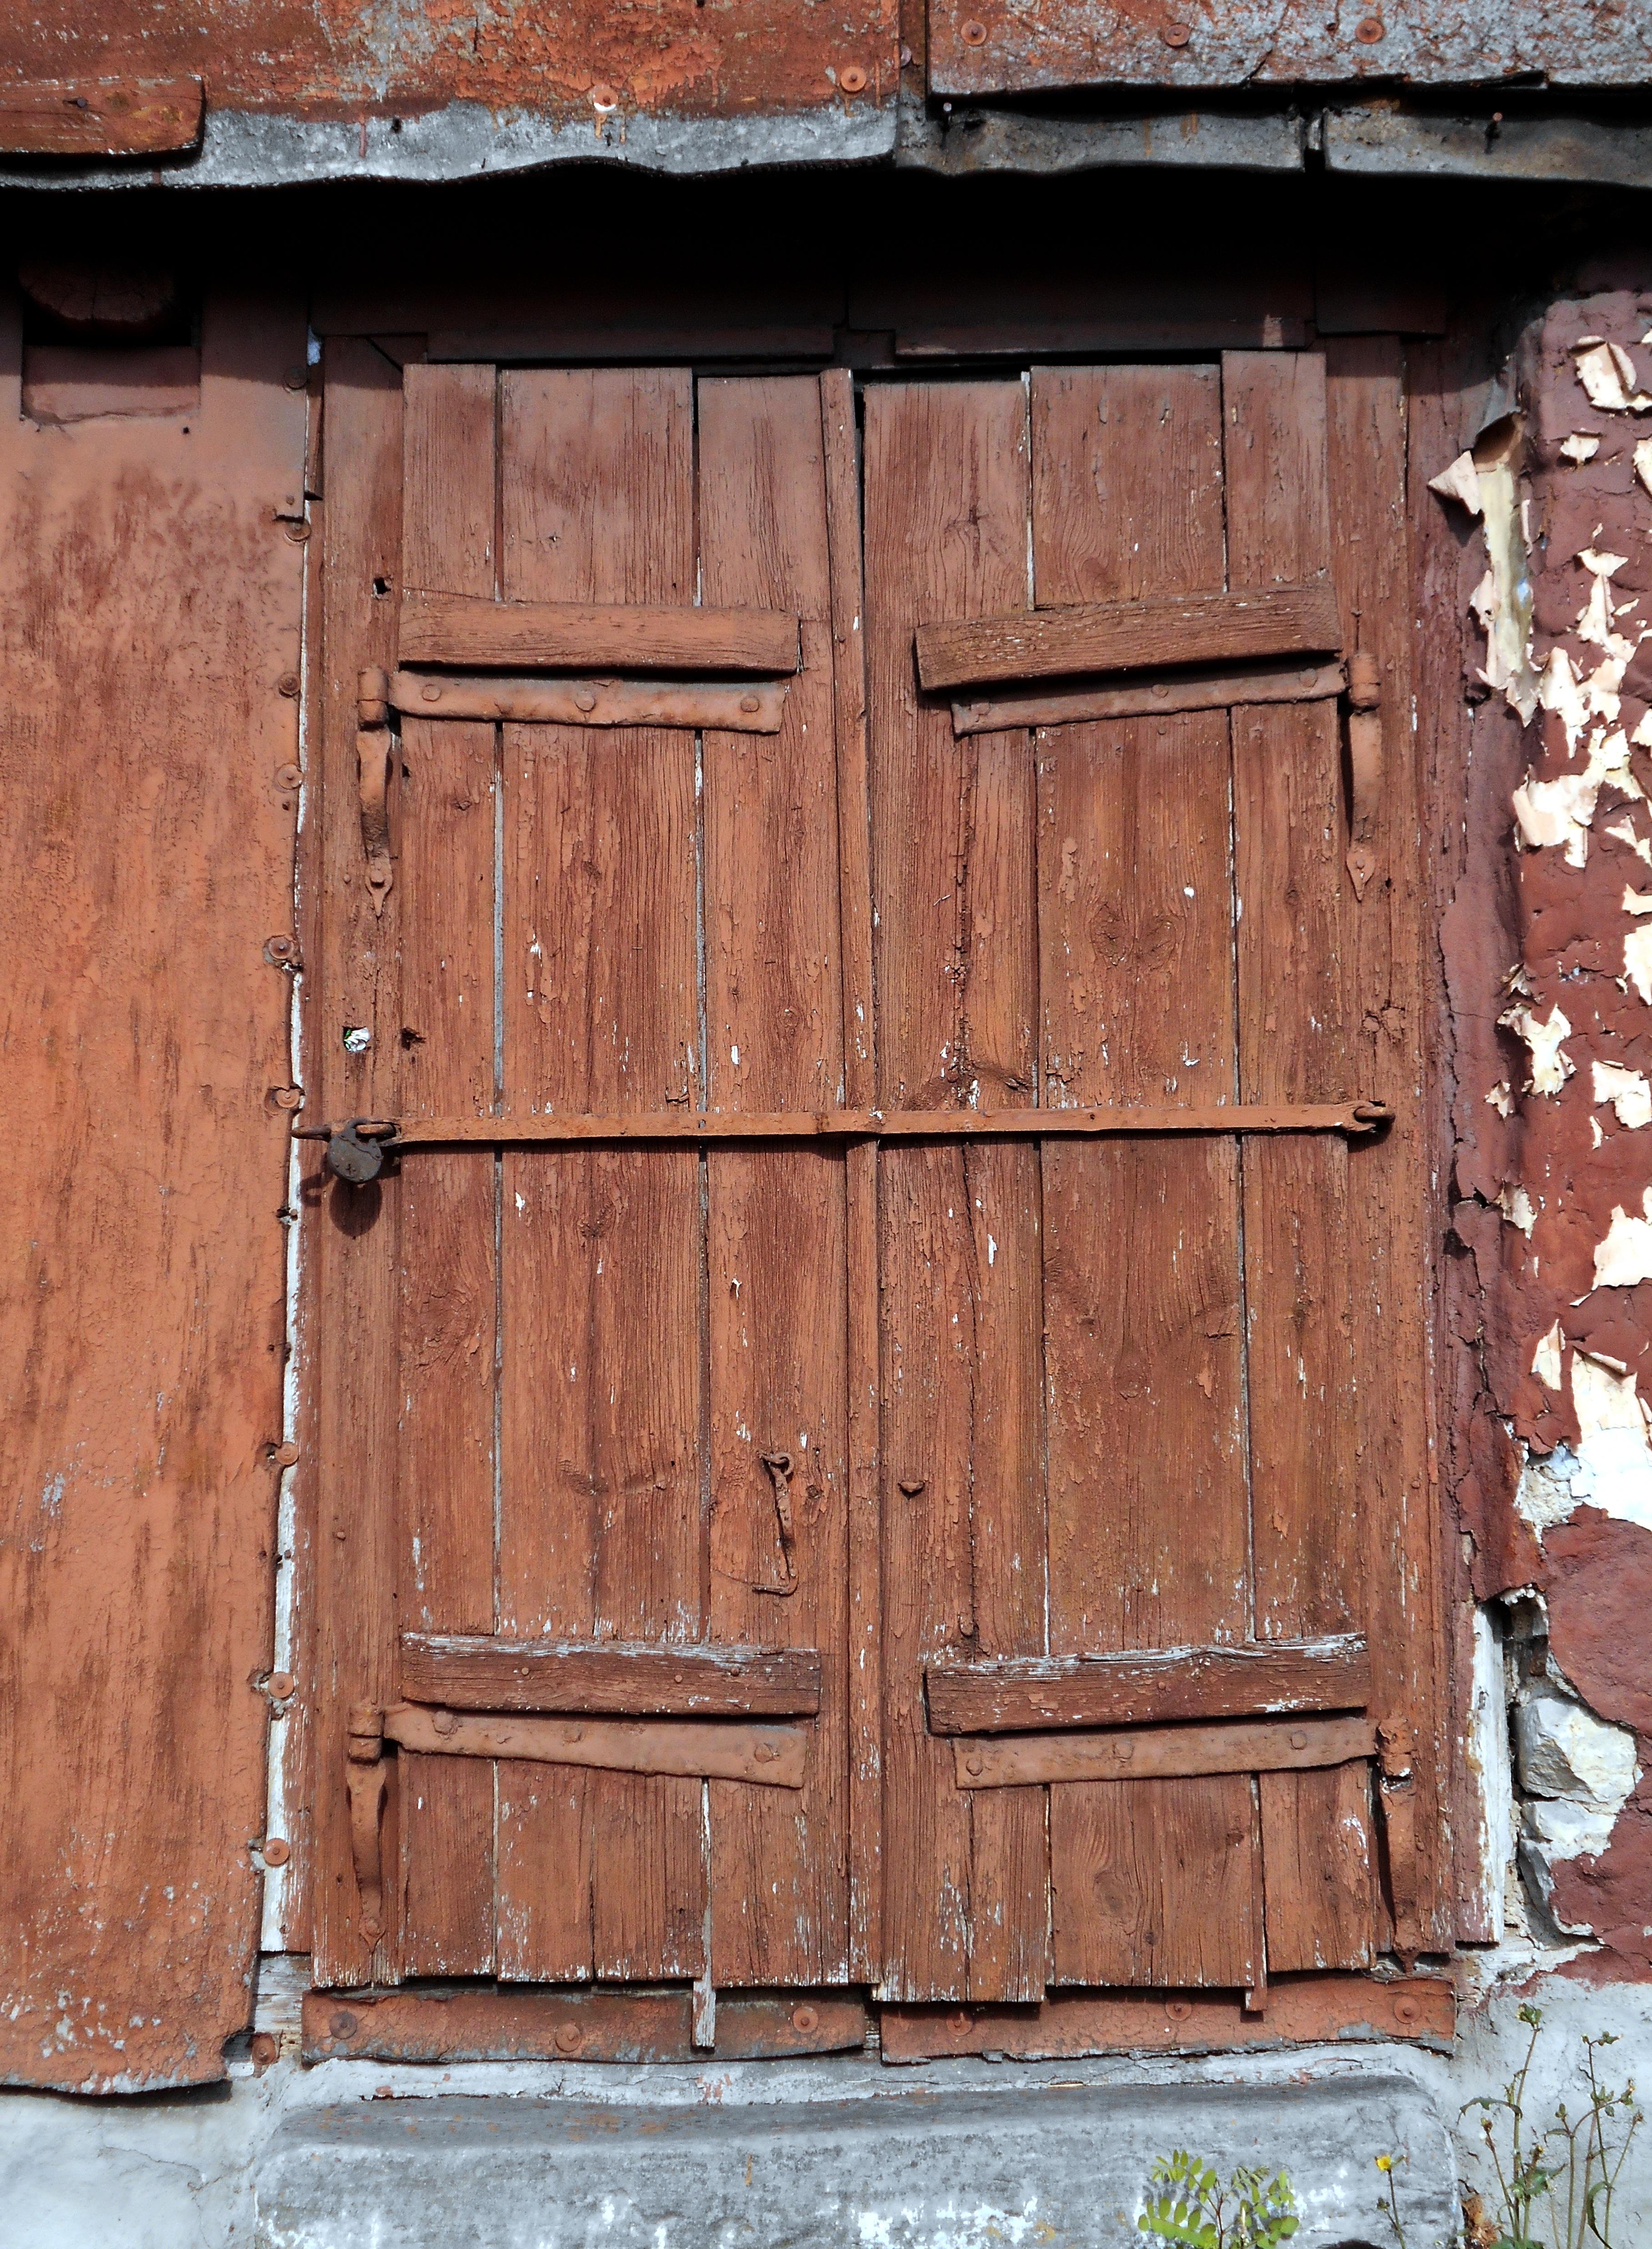 Fotos gratis : ventana, pared, cobertizo, Entrada, fachada, ladrillo ...